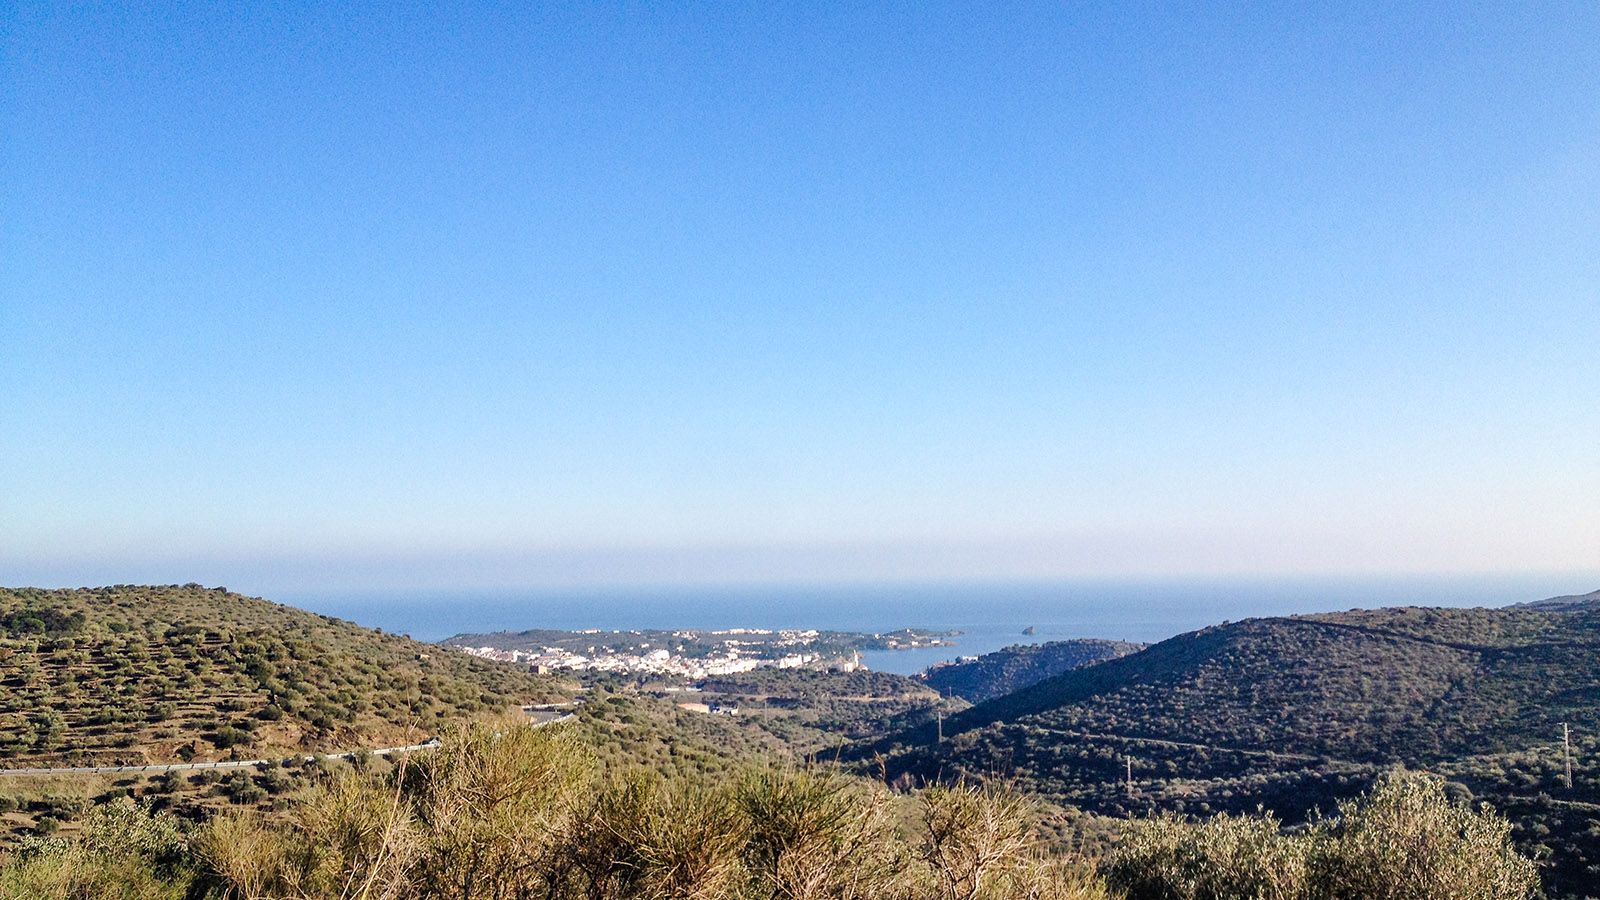 Costa Brava: Blick vom Cabo Creus auf Cadaqués. Foto: Hilke Maunder